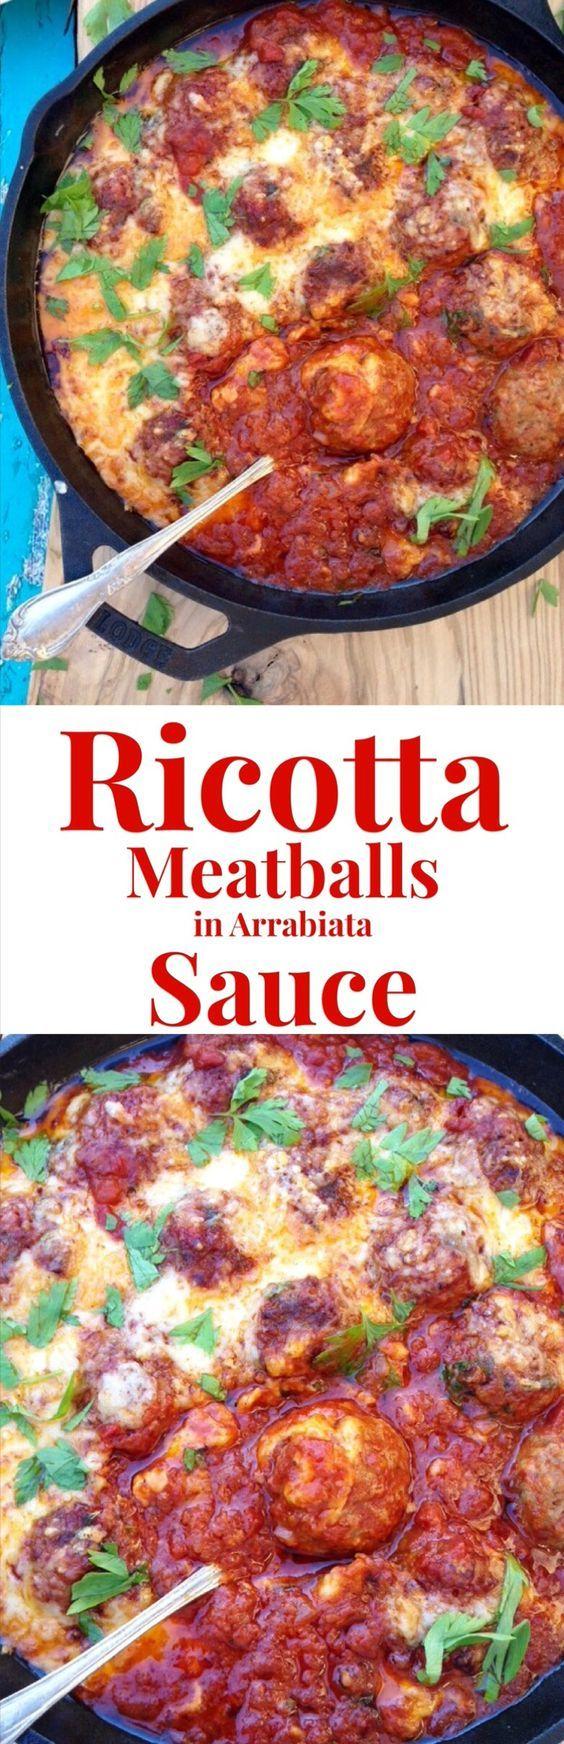 Ricotta Meatballs Recipe in Arrabiata Sauce | Recipe | Ricotta, Sauces ...